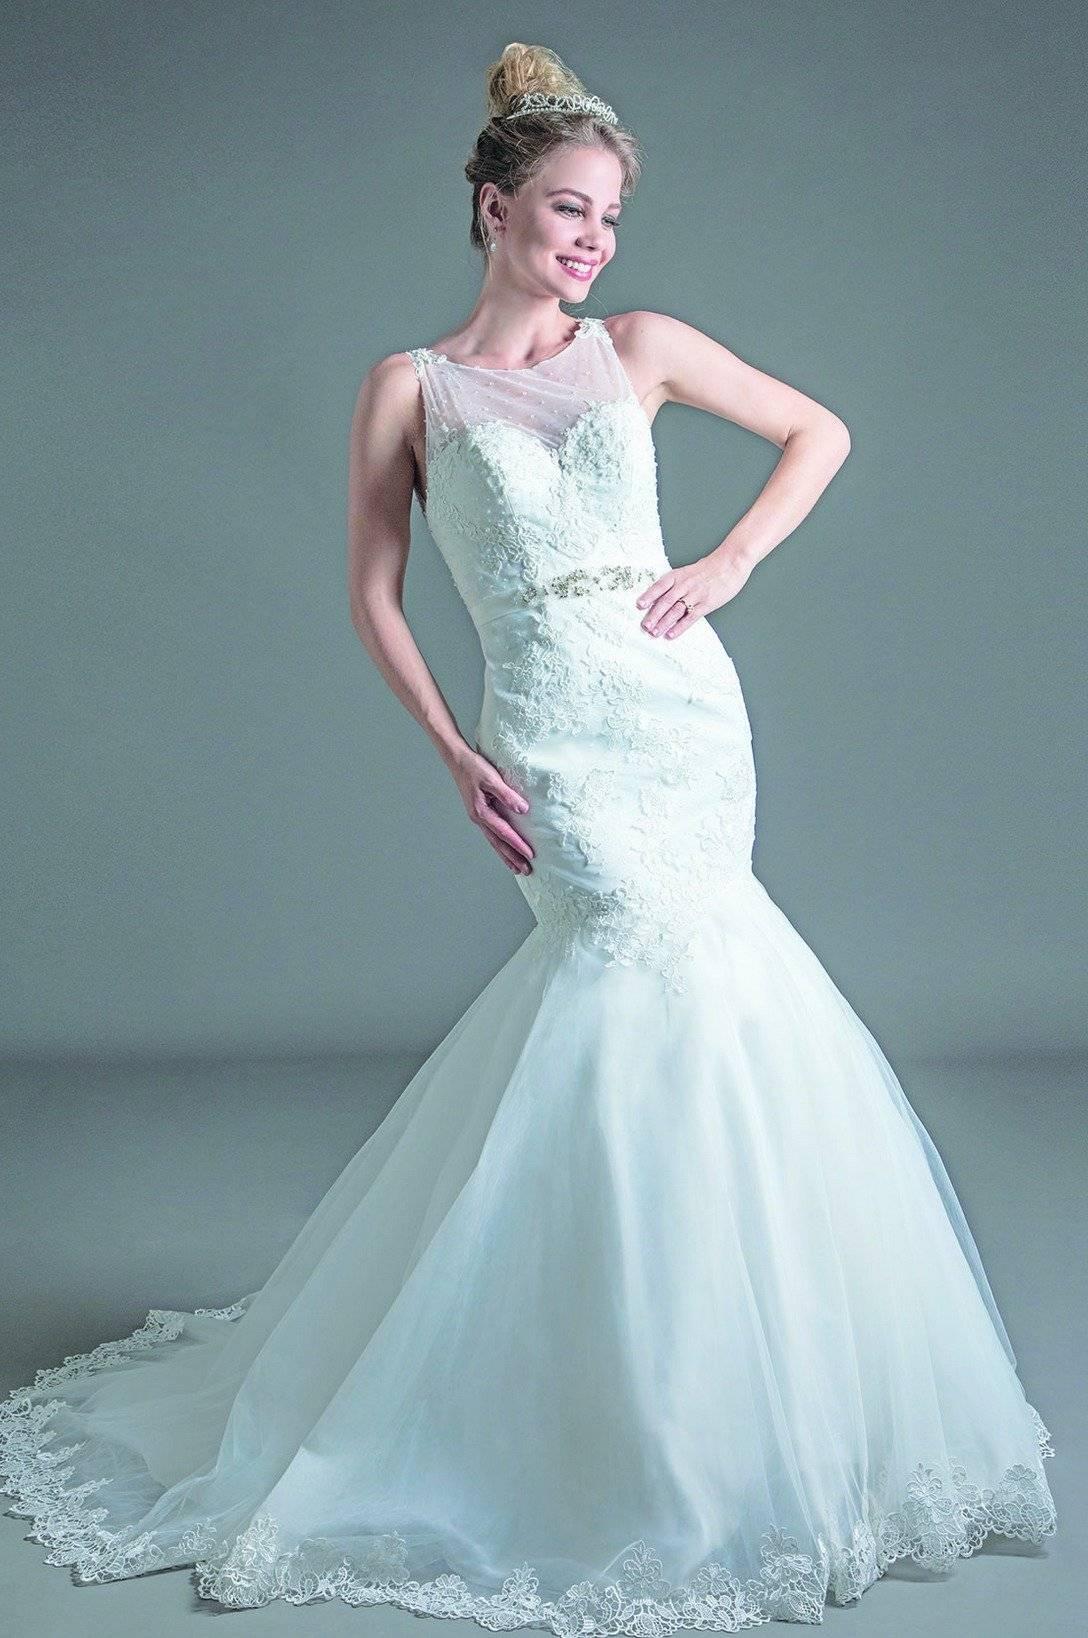 Cómo elegir tu vestido de novia? | Publimetro México